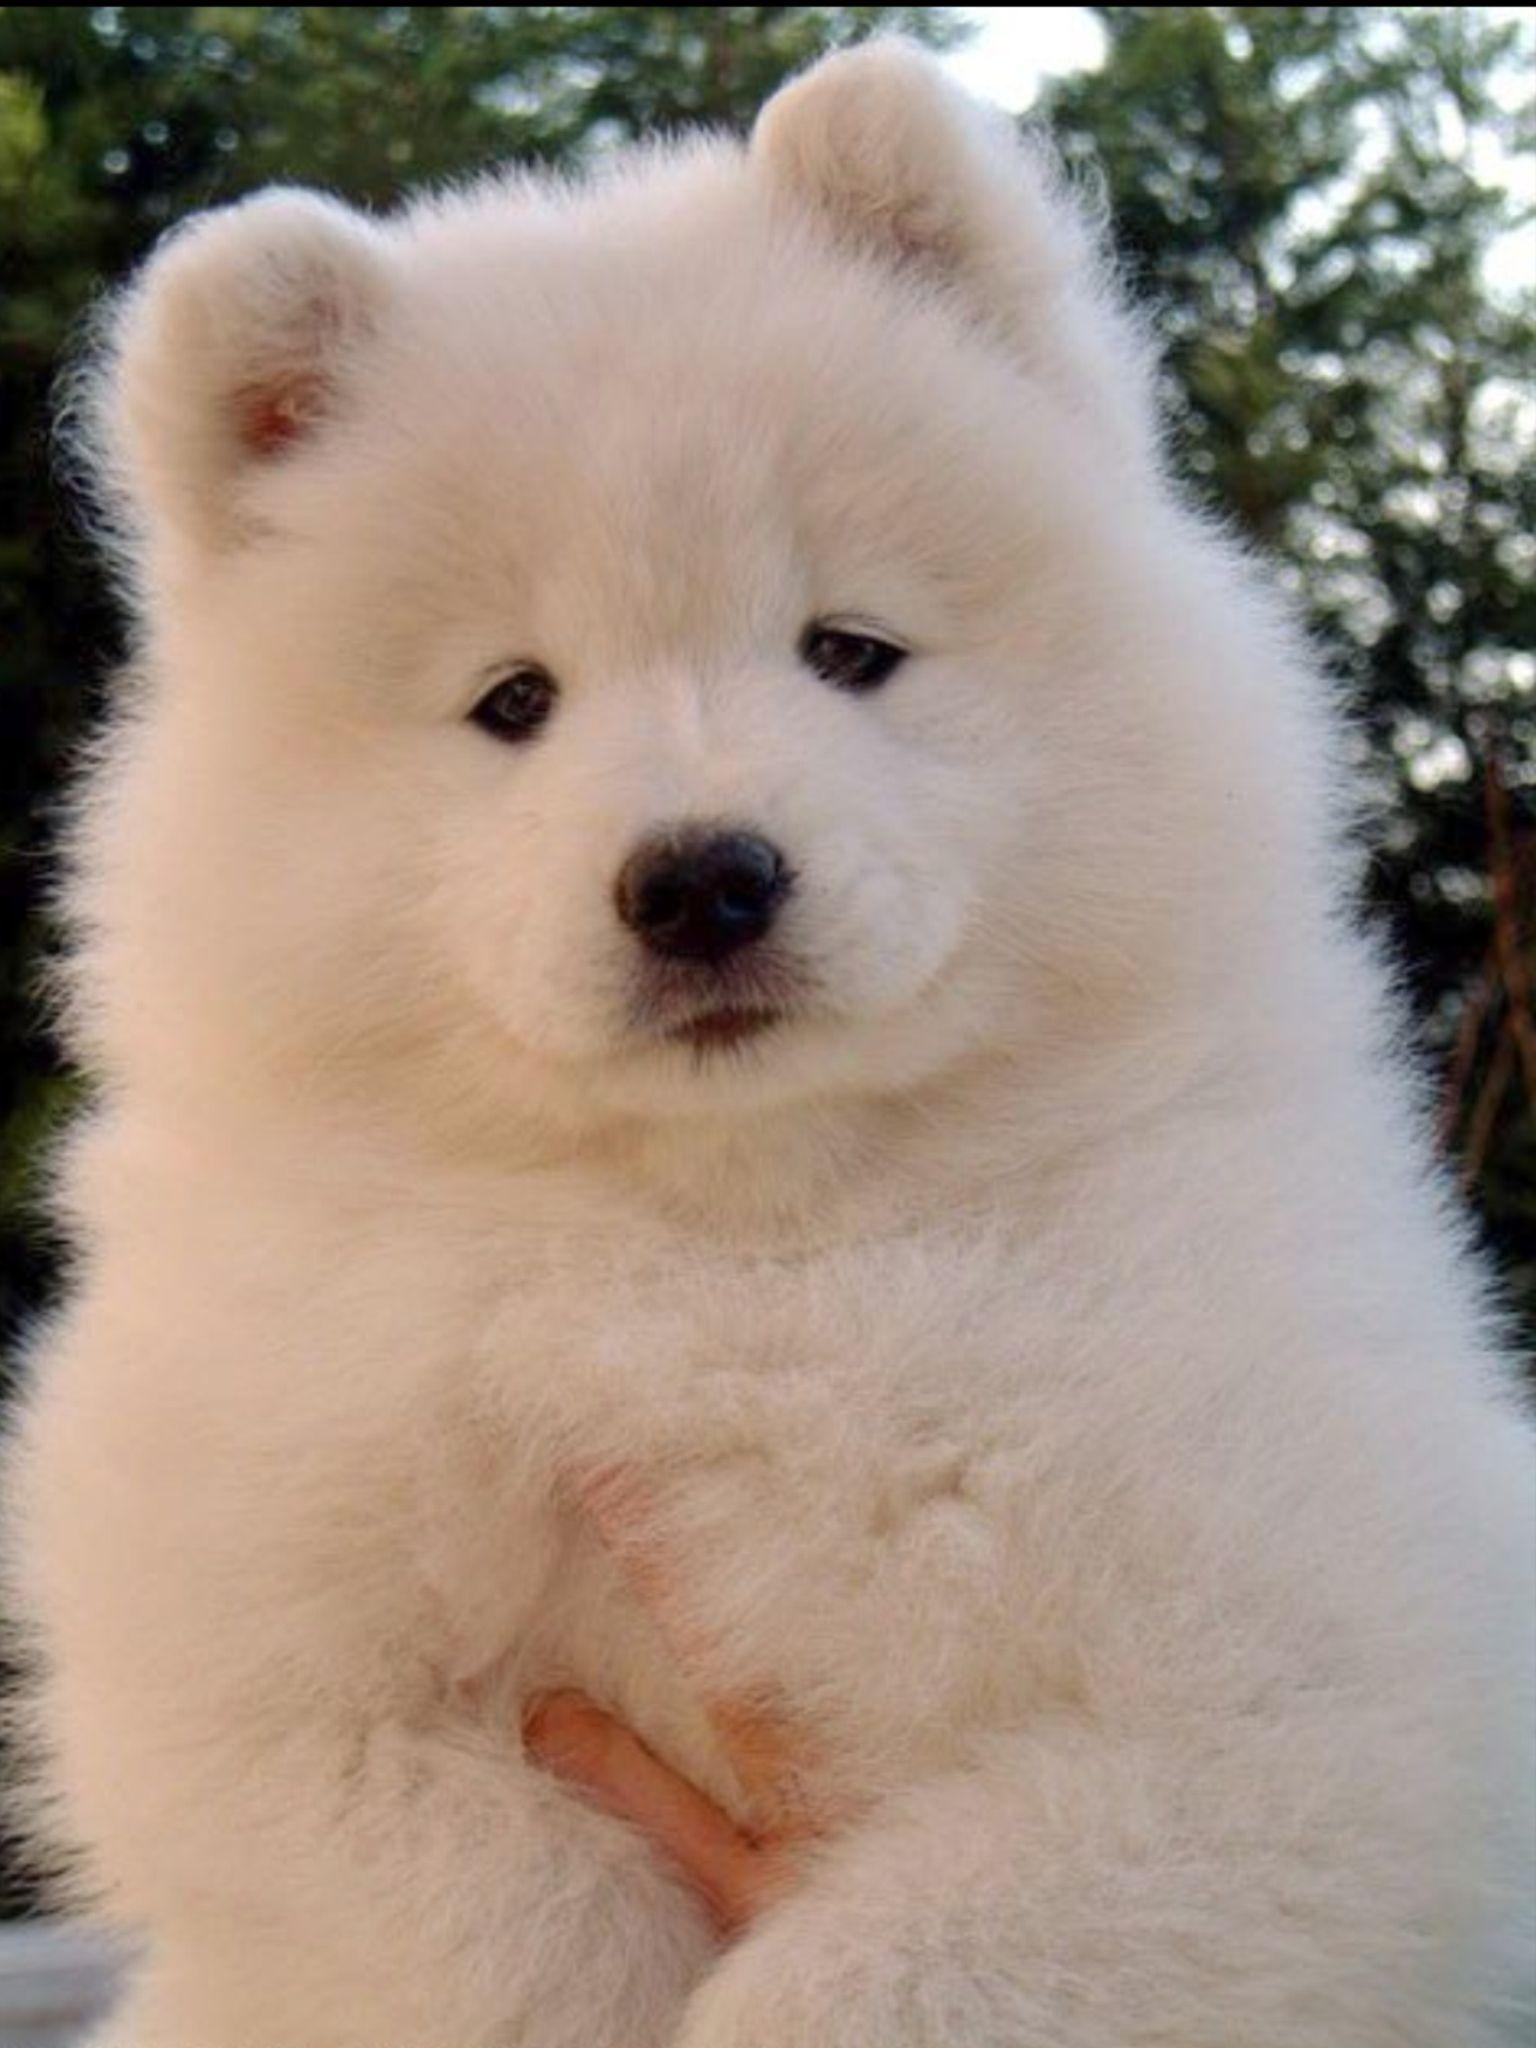 Top Samoyed Chubby Adorable Dog - f0ba802051303fb9a130c03f01f07197  Gallery_662325  .jpg